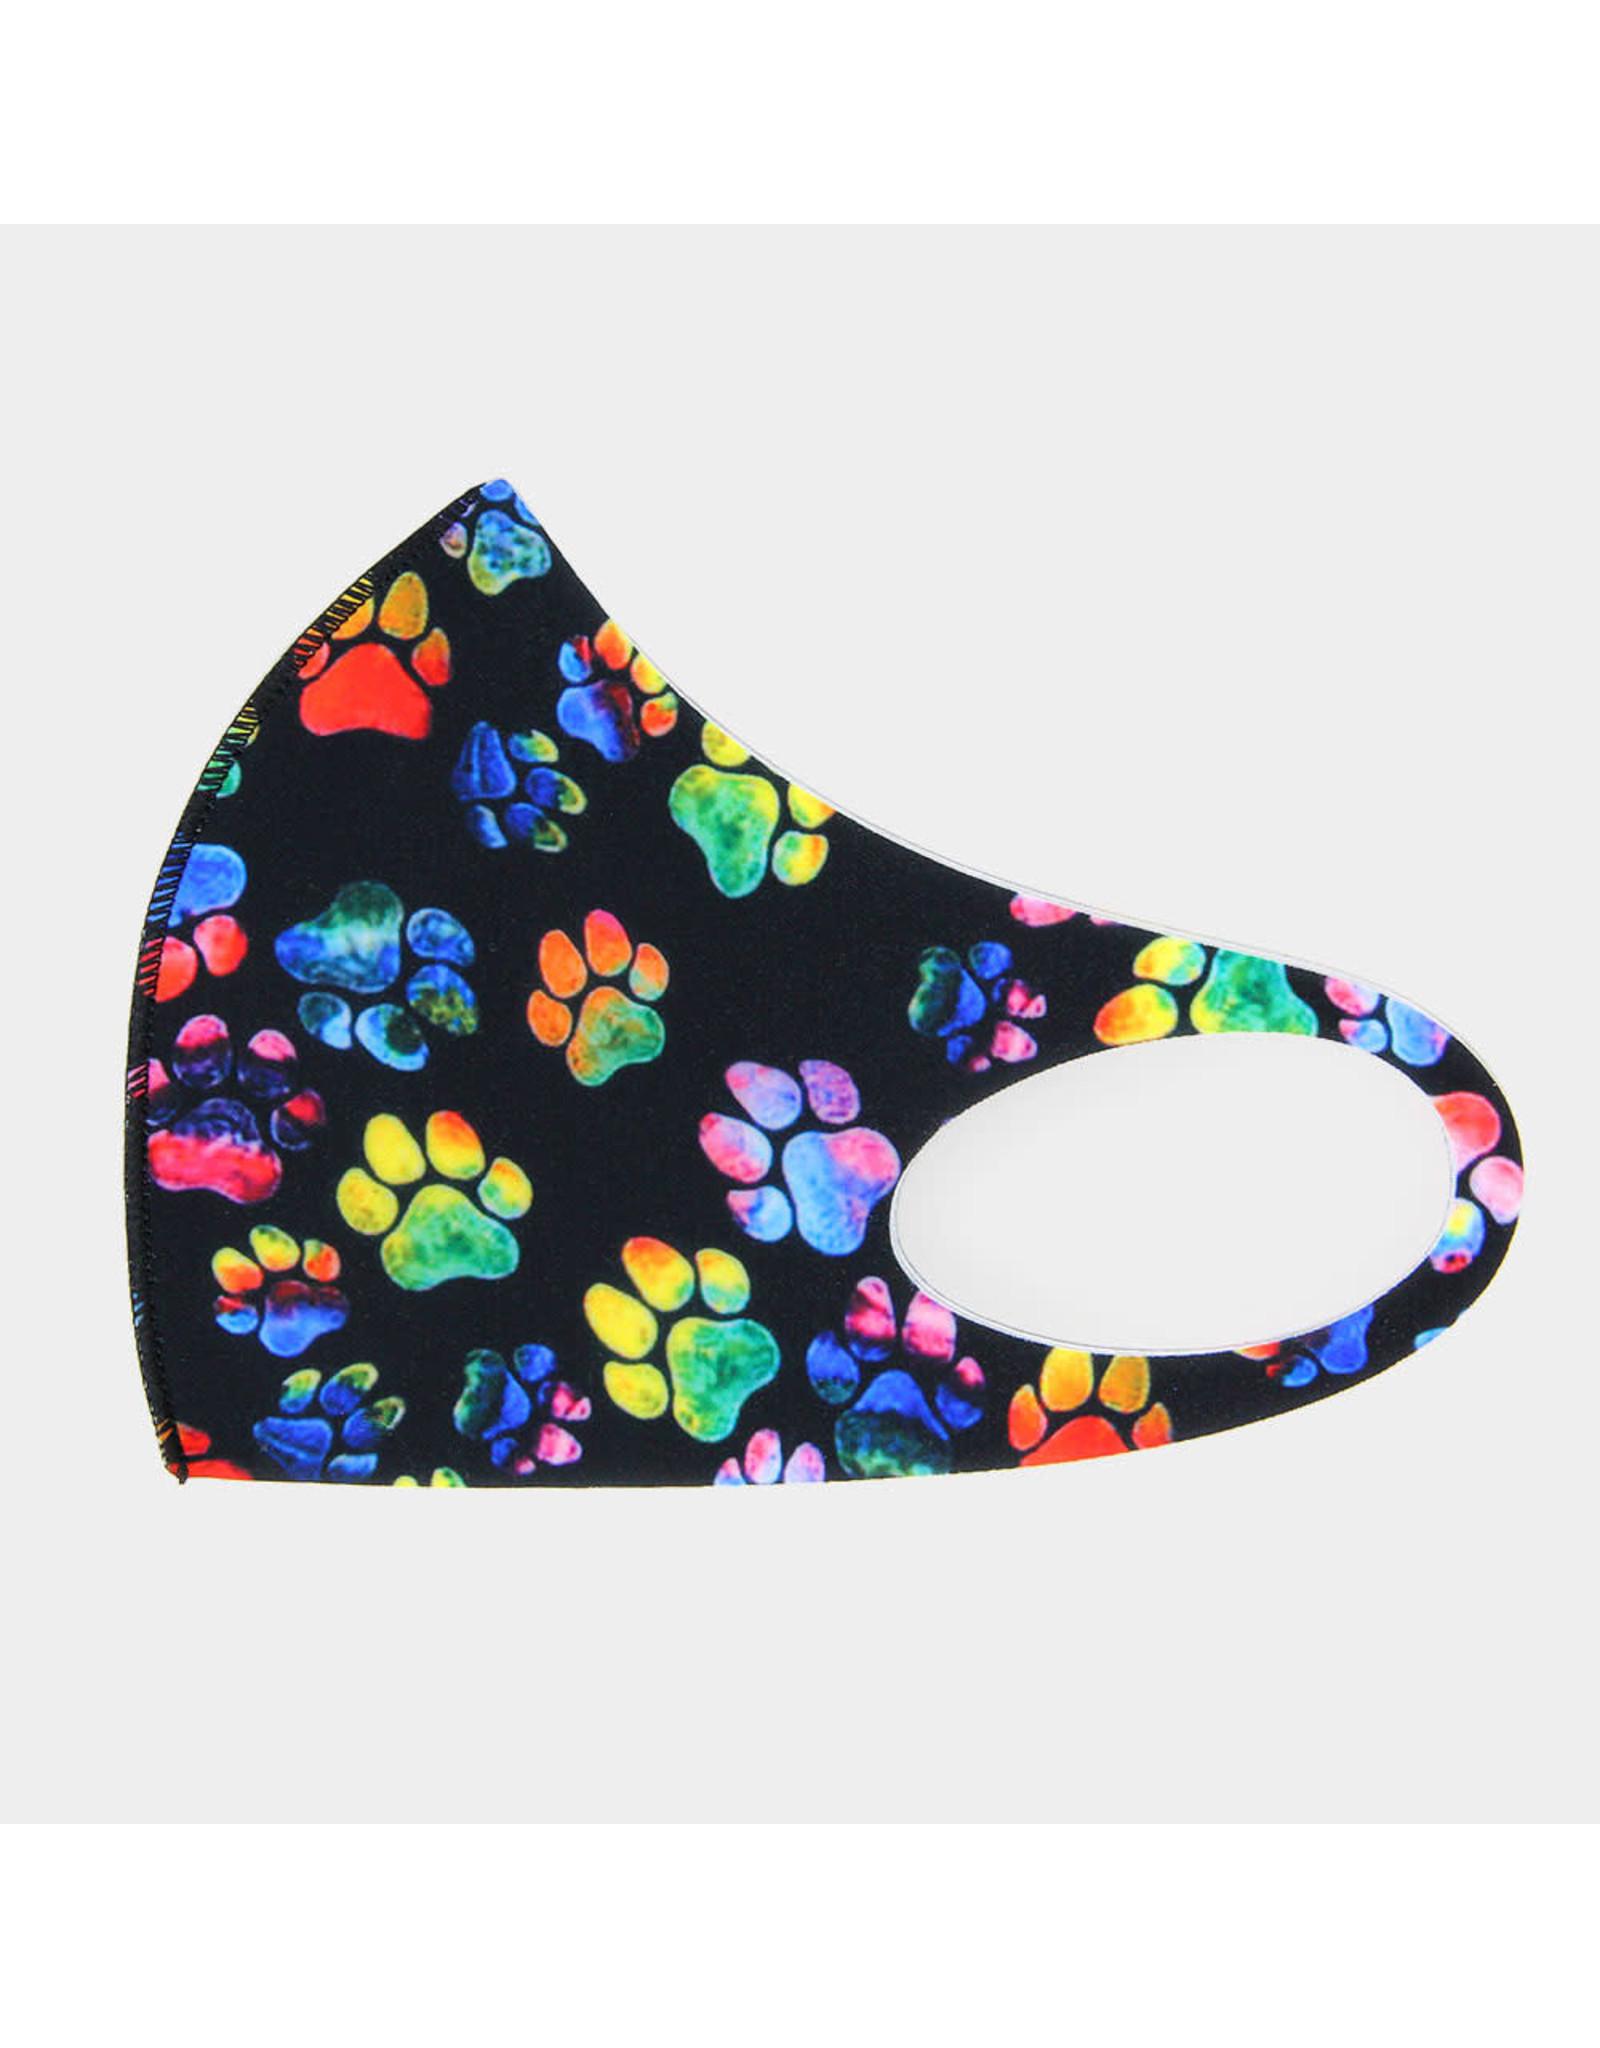 Paw Print Mask